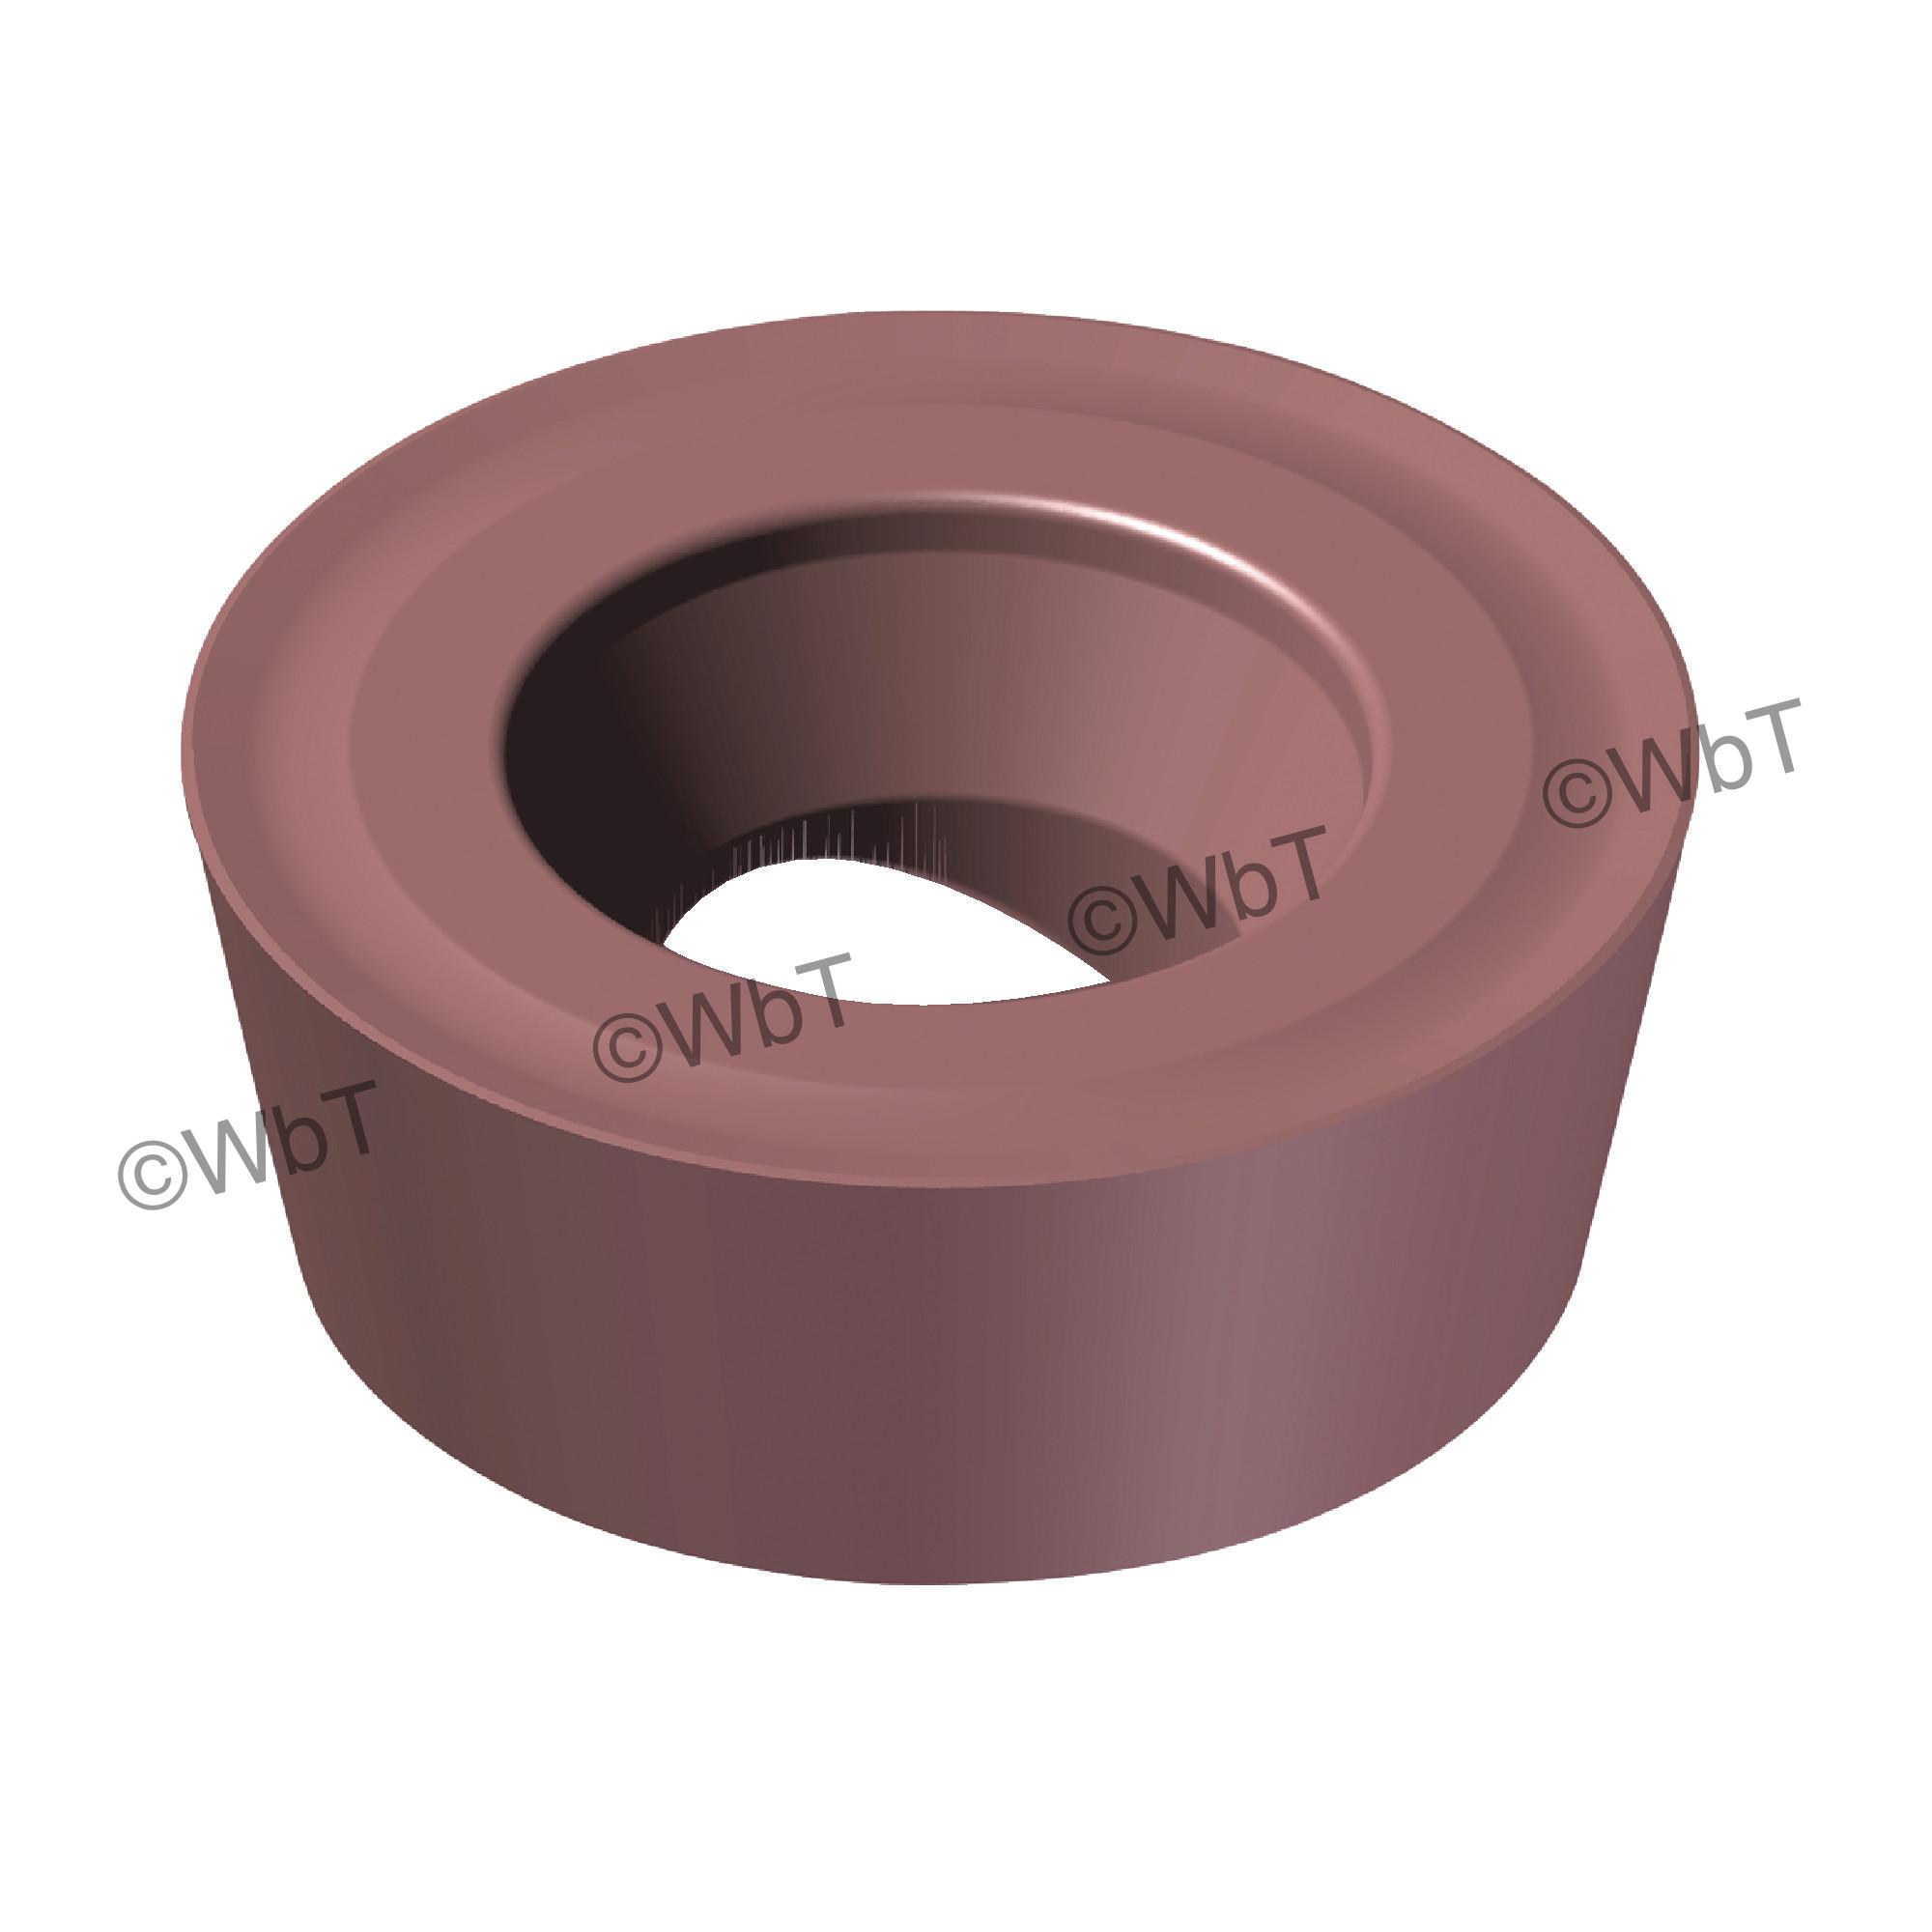 AKUMA - RPMT1204M0S-M1 PM15M Round / Indexable Carbide Milling Insert